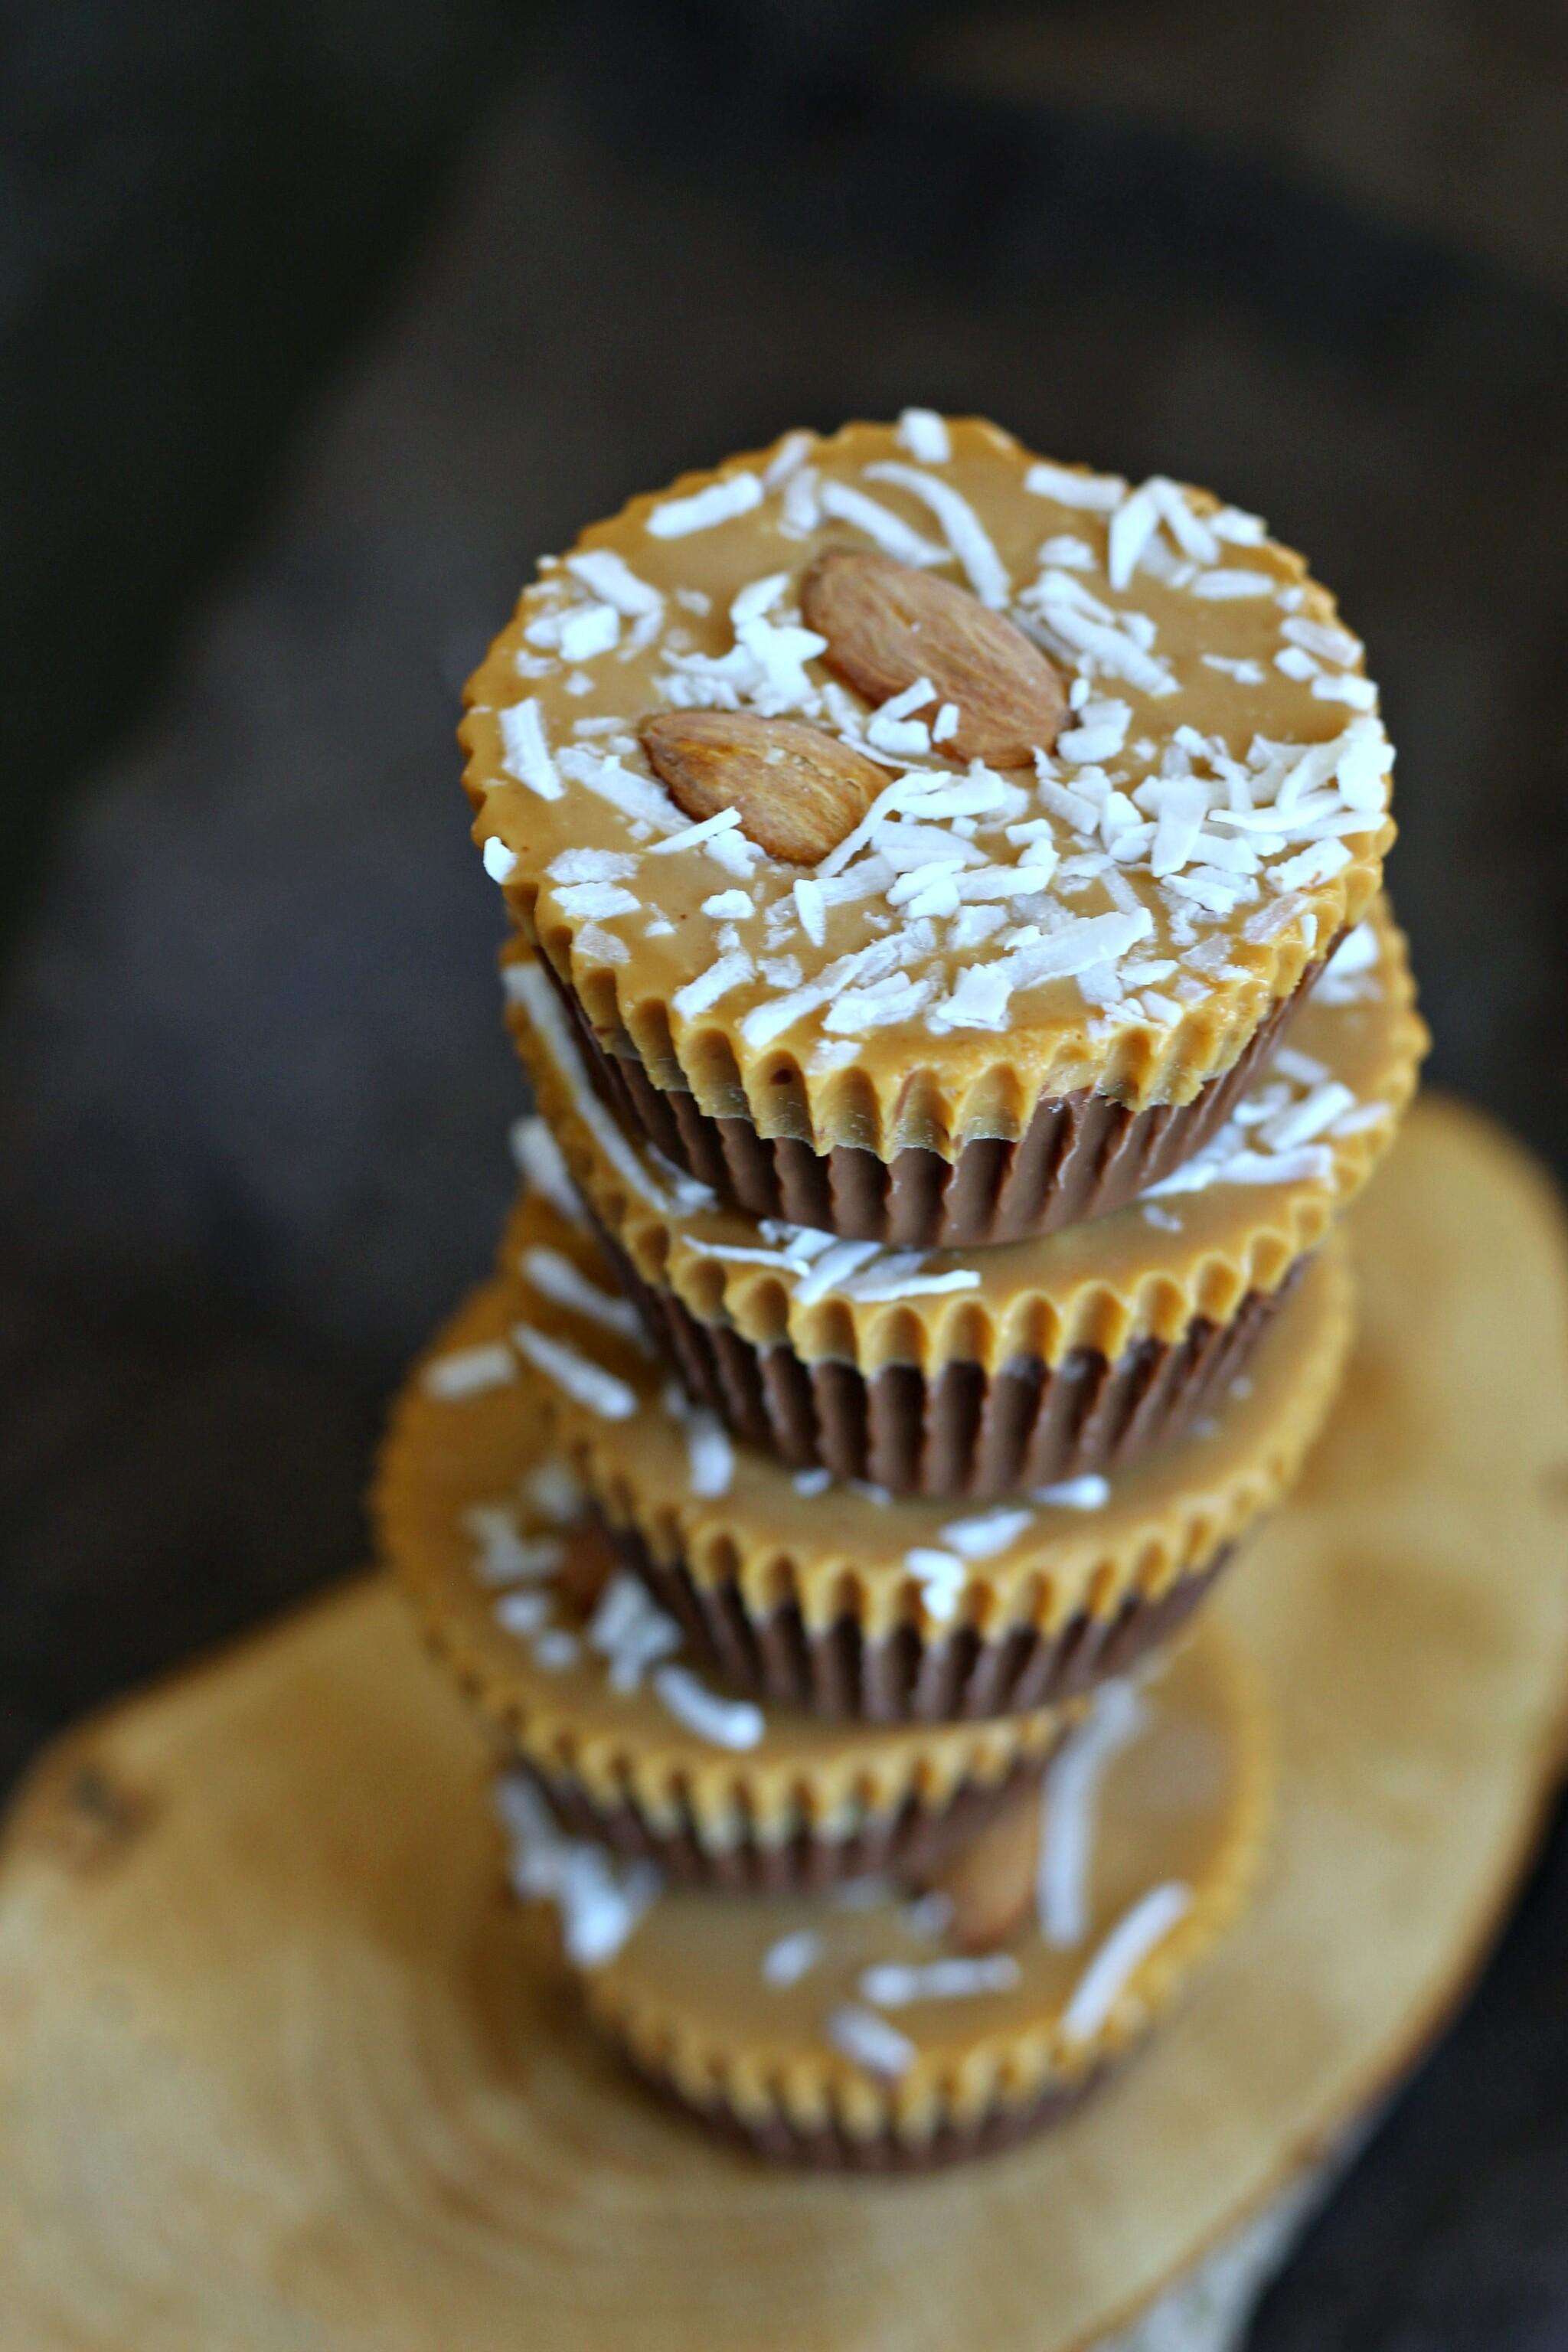 Delicious allergy friendly Vegan and Gluten-free Chocolate Peanut Butter Cup   gardeninthekitchen.com